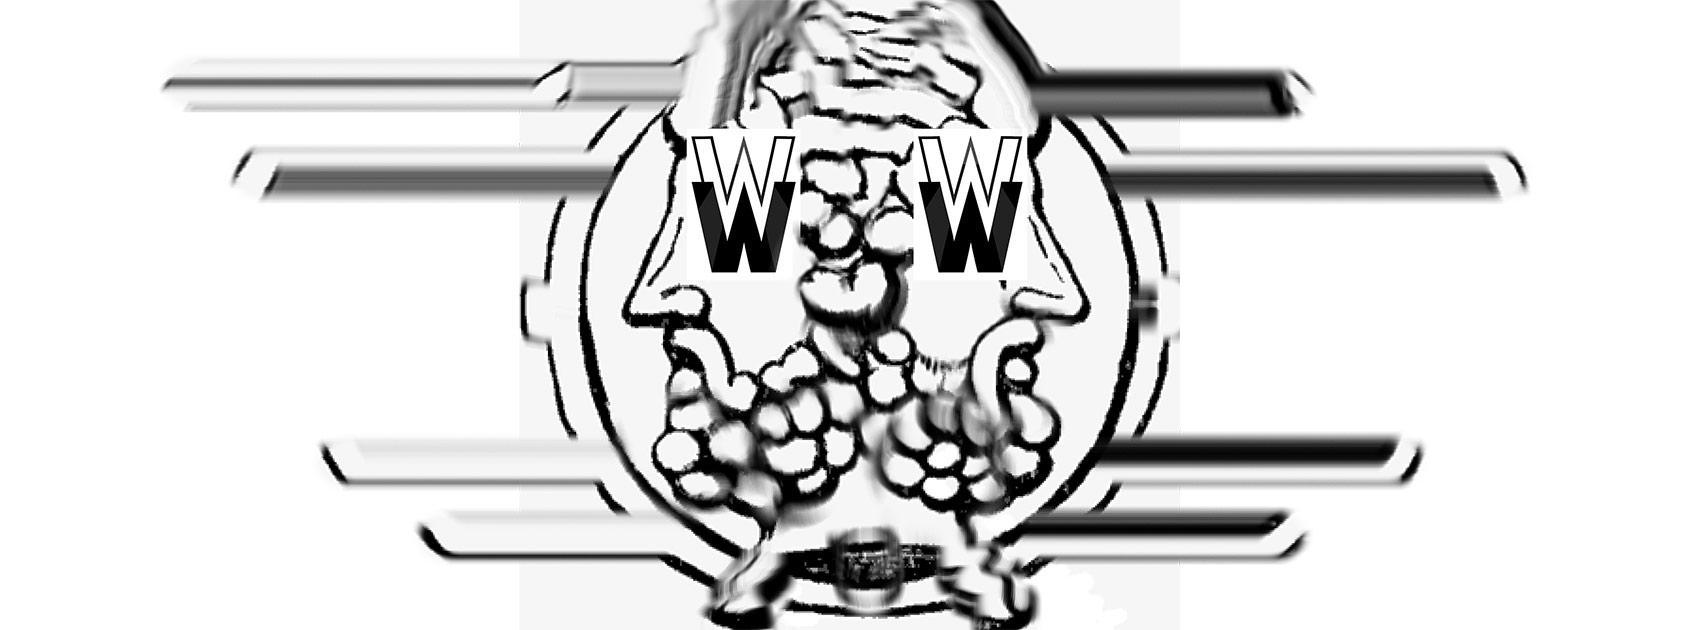 WWubblehead Janus